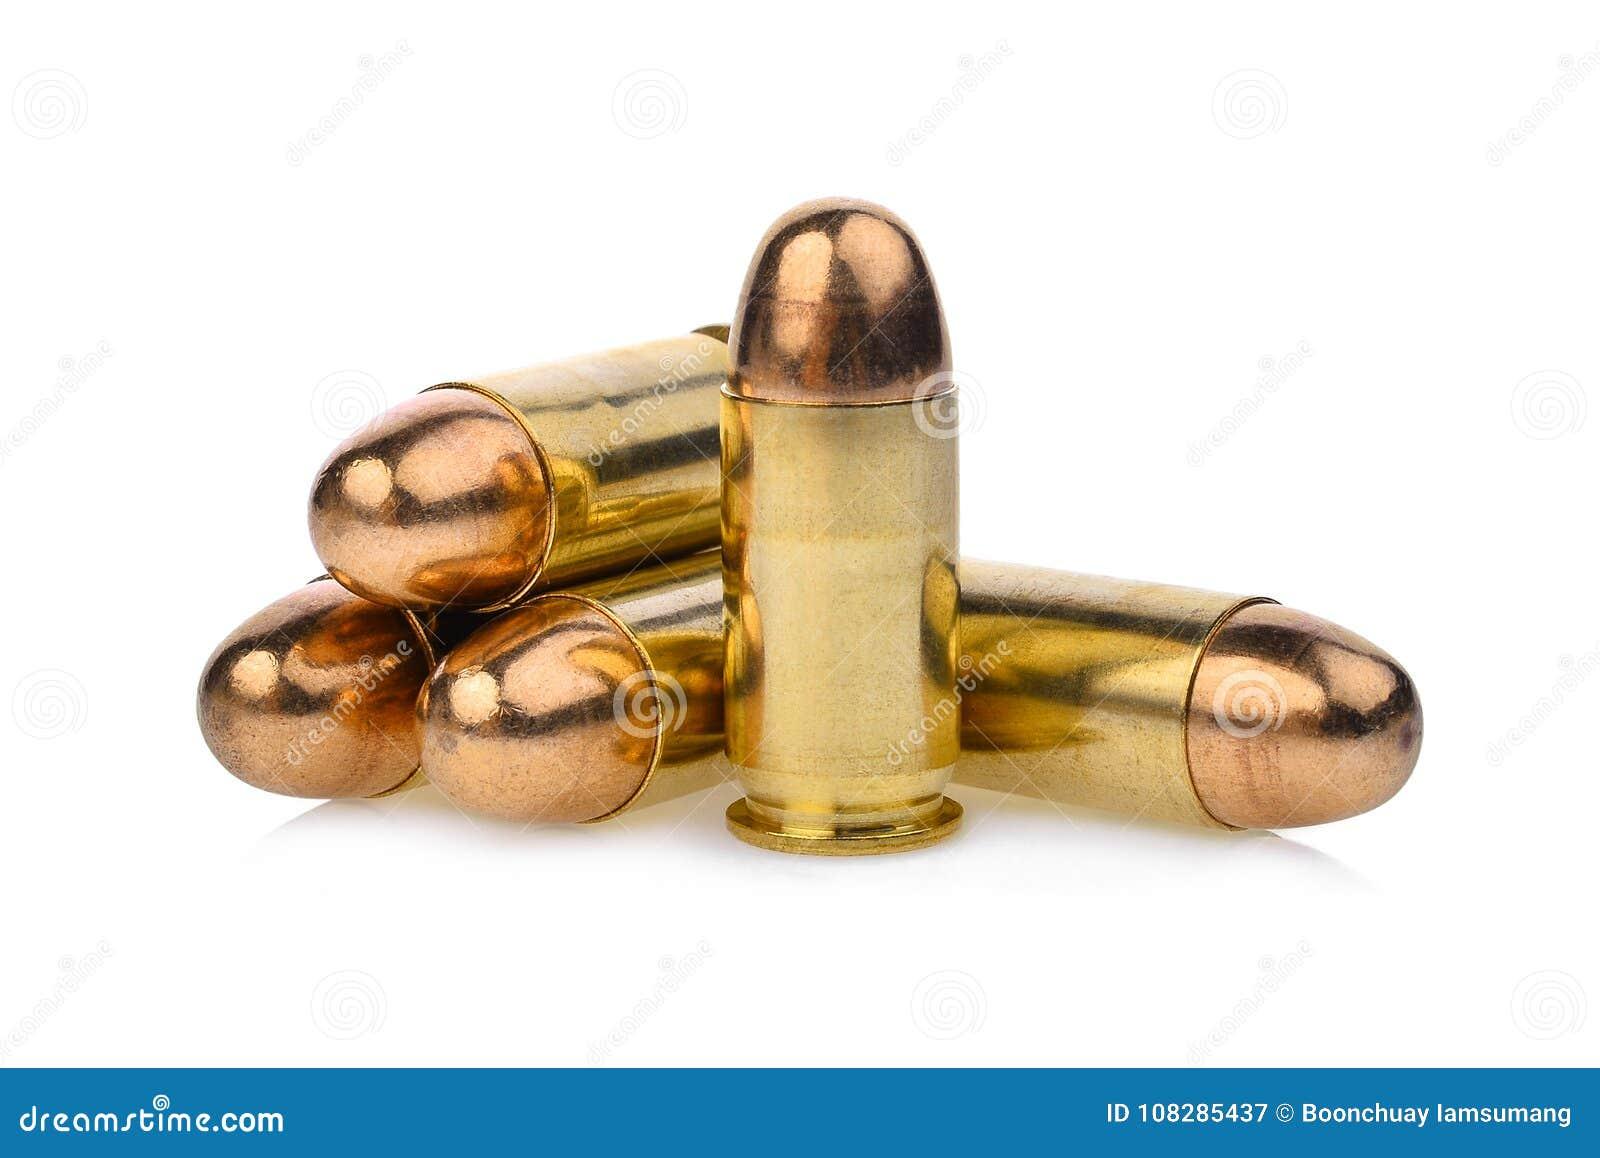 .45 ACP手枪弹药和配件箱弹药筒 45把ACP手枪弹药,充分的金属夹克